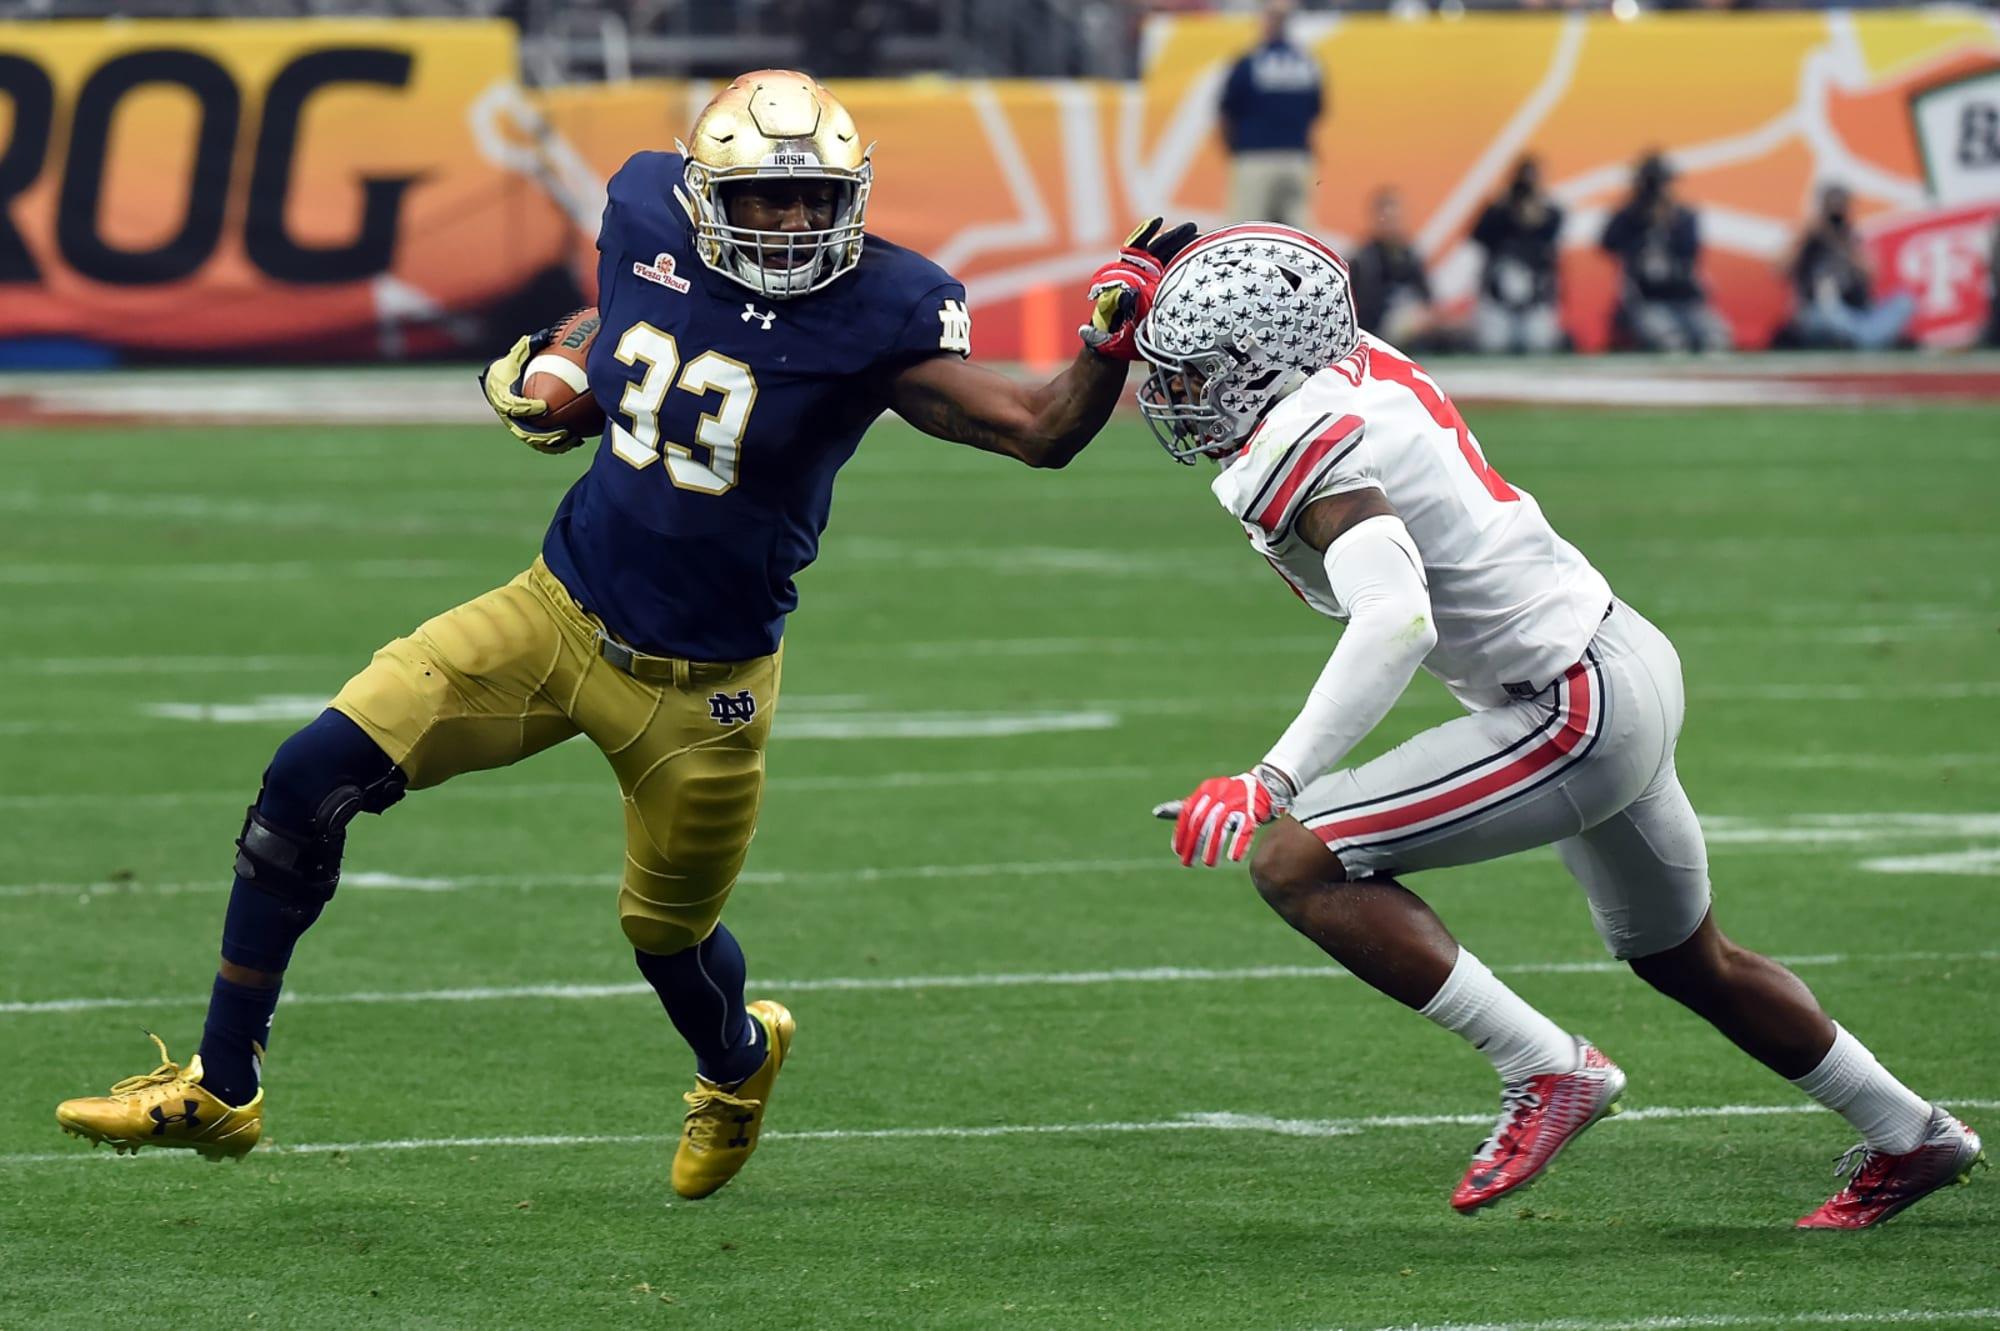 Notre Dame Football Spotlight: Top 5 Rushers In School History